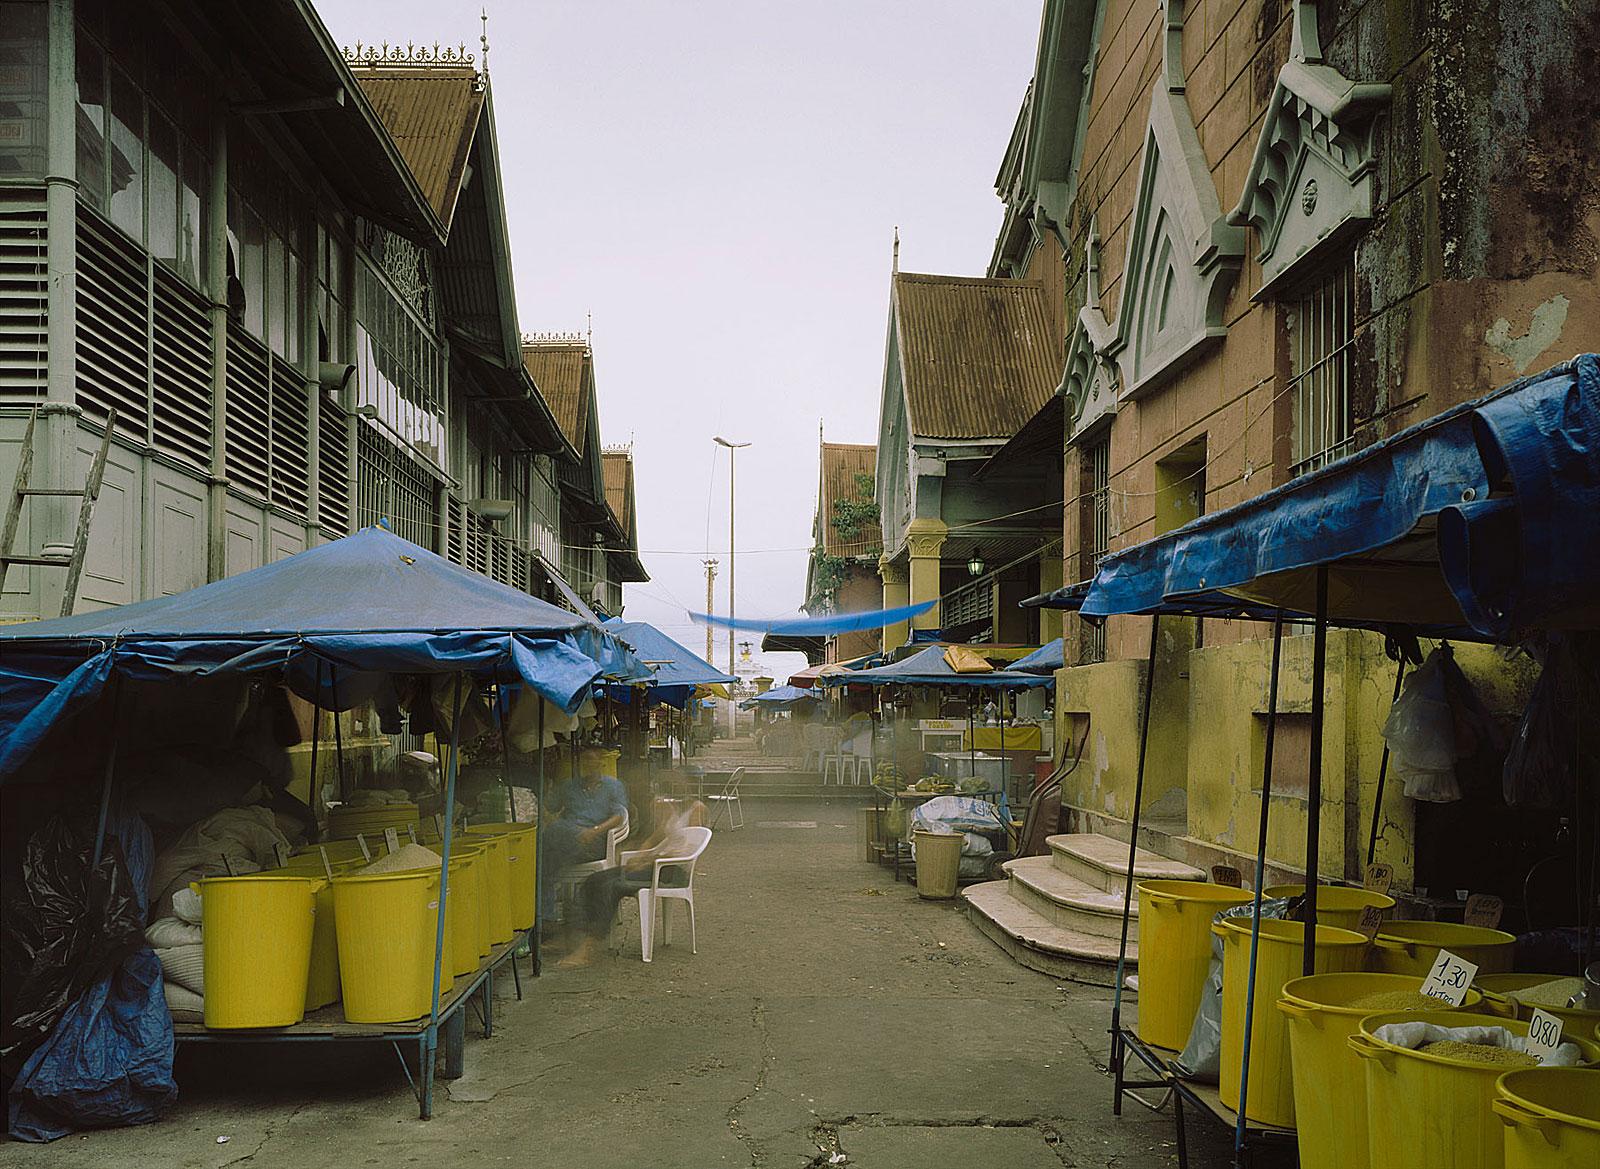 Mercado Adolpho Lisbôa, Manaus (11.26 - 11.36 Uhr, 28.7.2003)